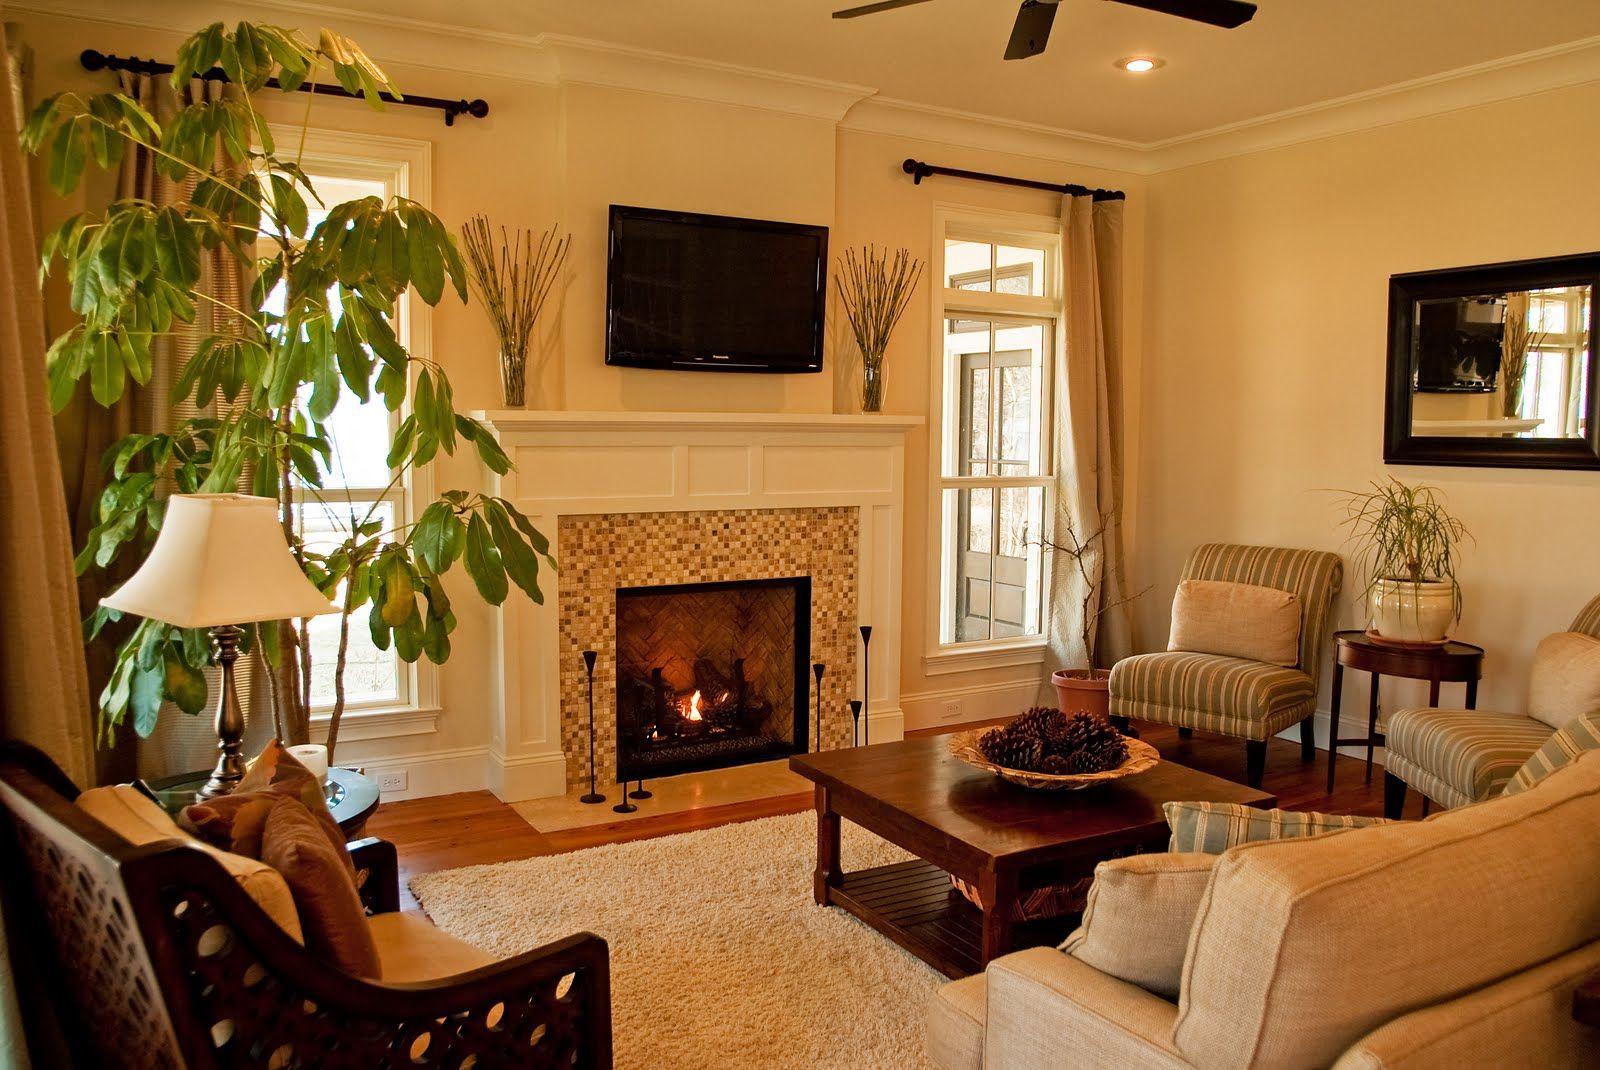 20 Beautiful Bedrooms With Fireplace And Tv Setups Cozy Li